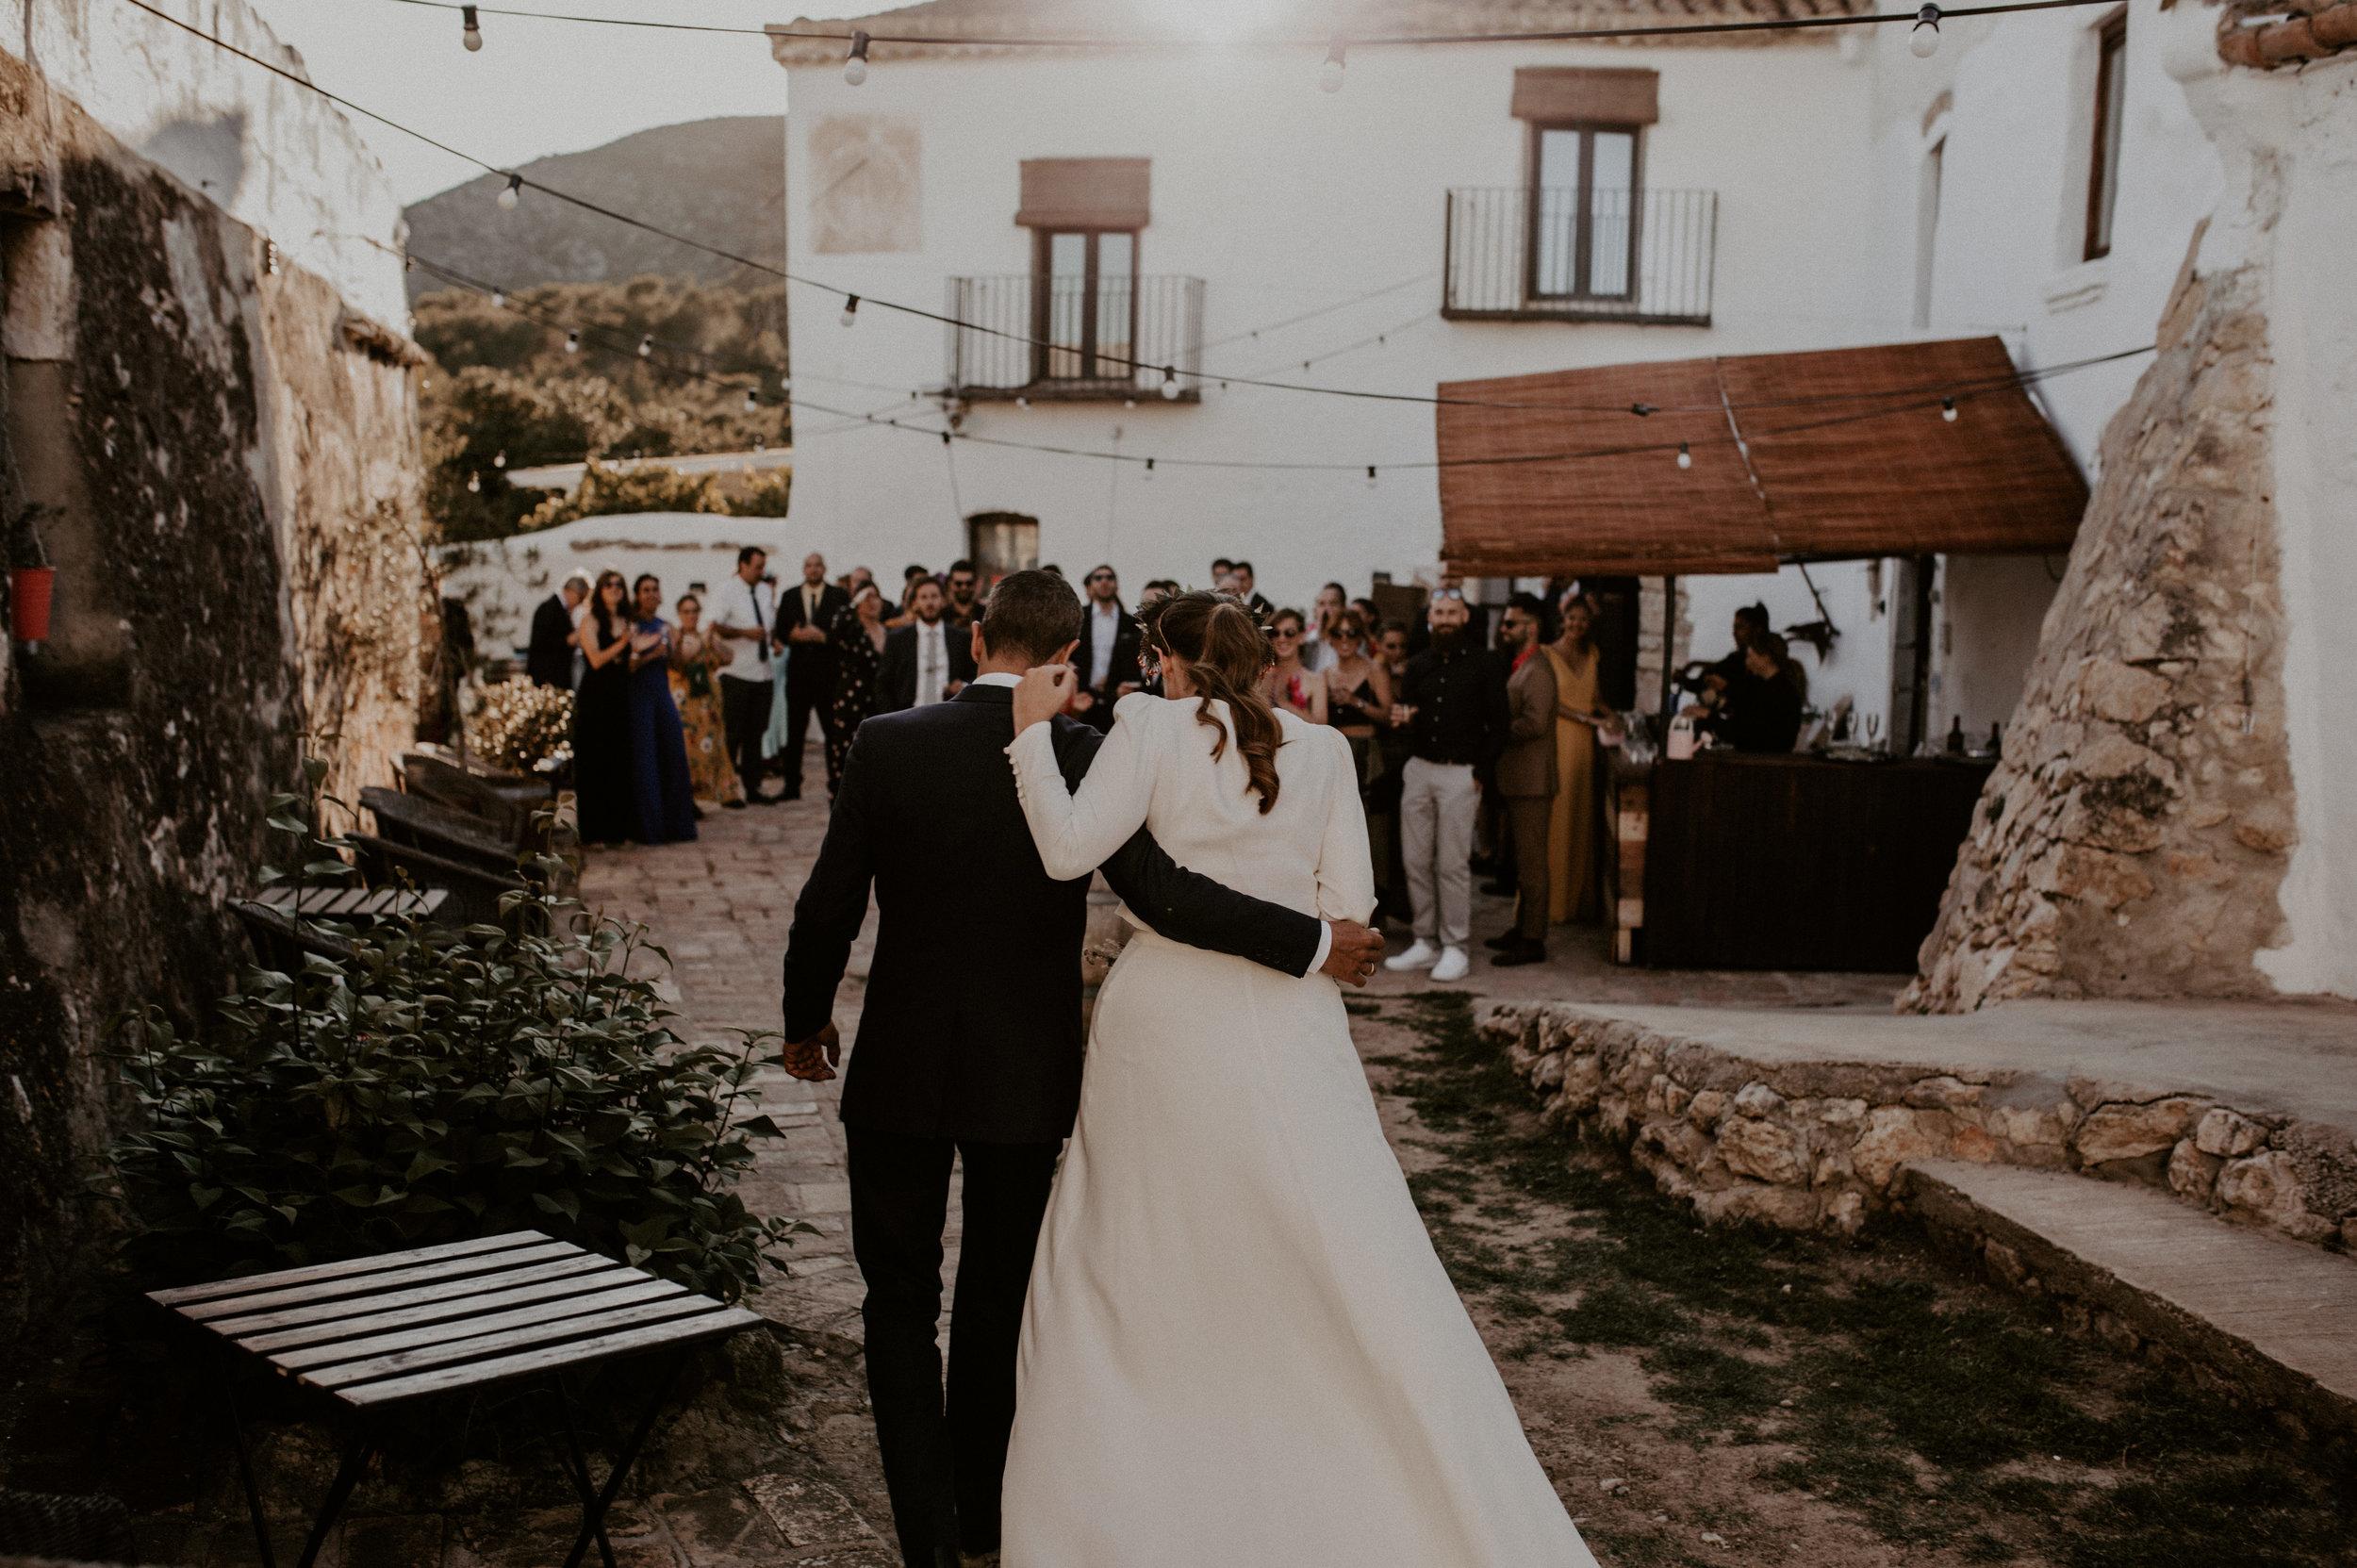 thenortherngirlphotography-fotografa-de-bodas-barcelona_destinartion-wedding-photographer_wedding-photographer_moroccan-wedding_HADNANANTIGONA-794.jpg